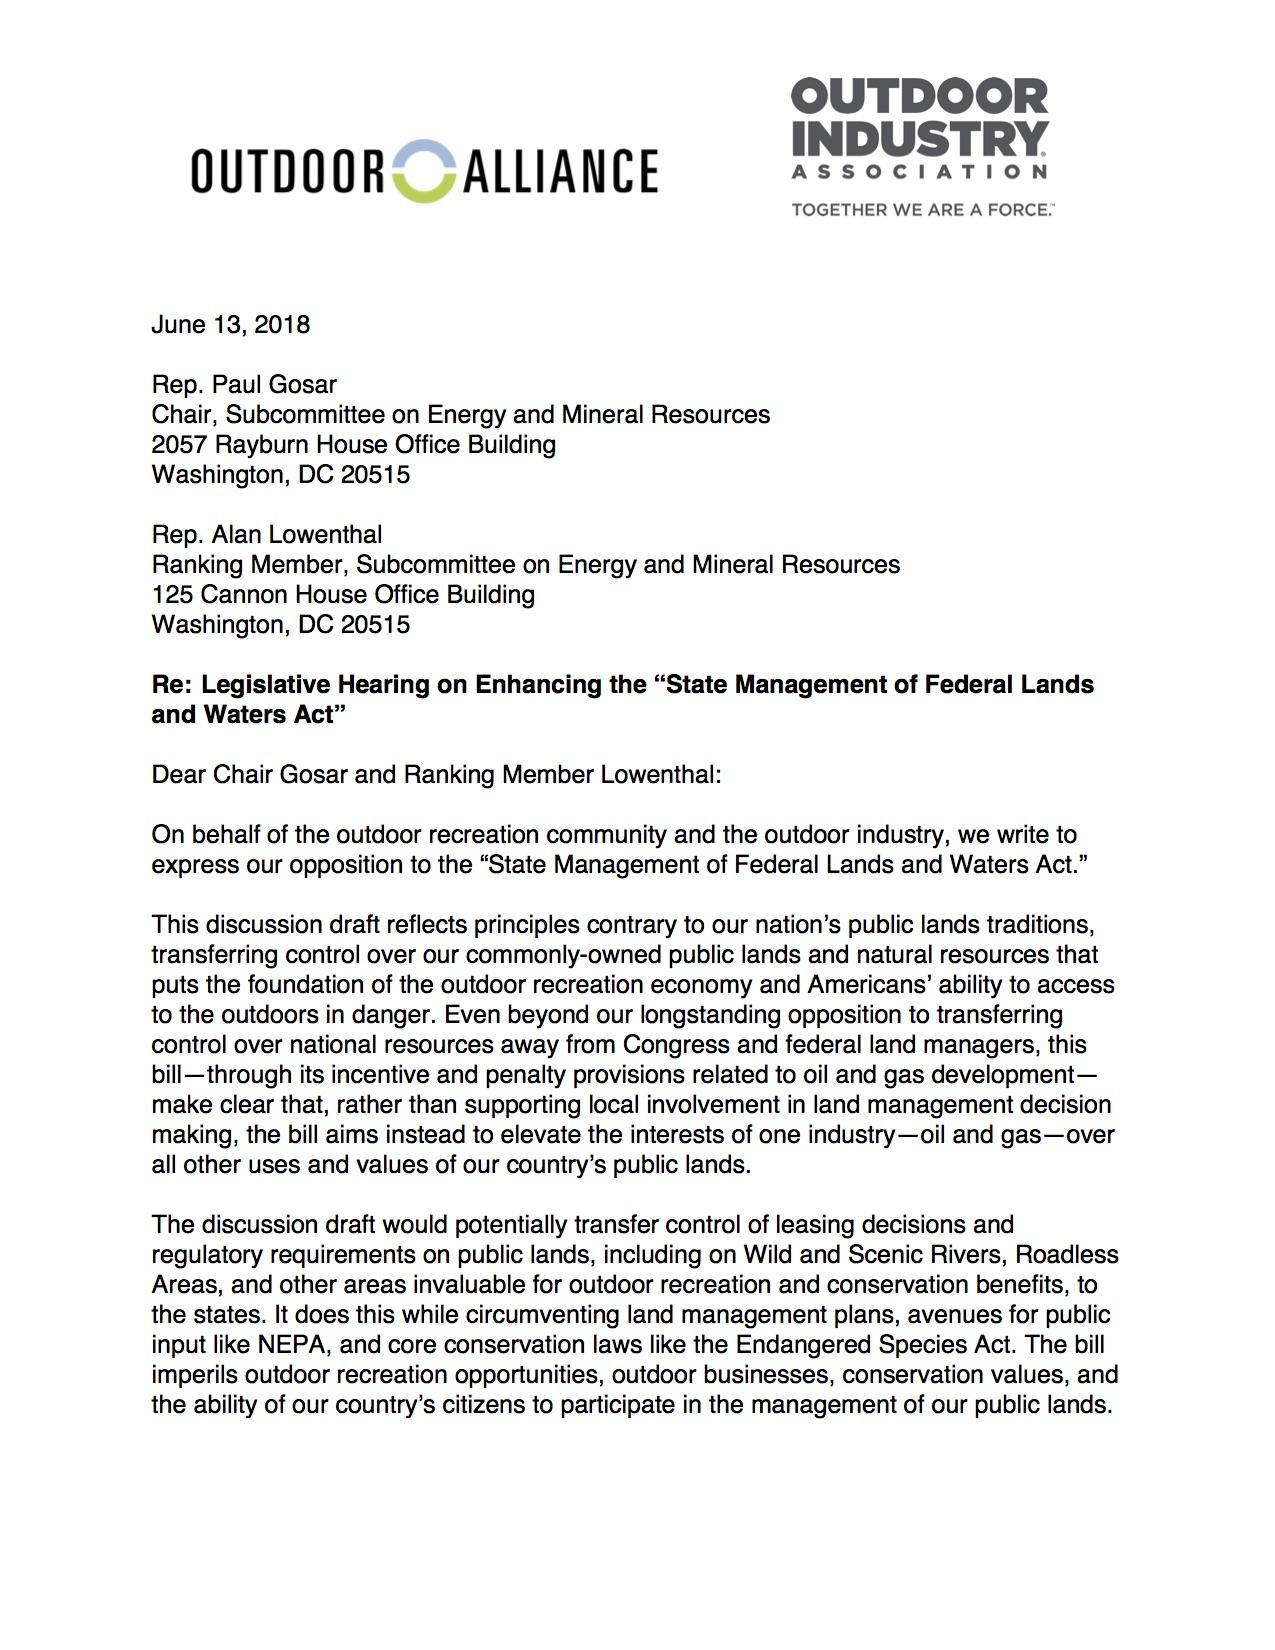 OA-OIA State Mgmt hearing Final copy.jpg